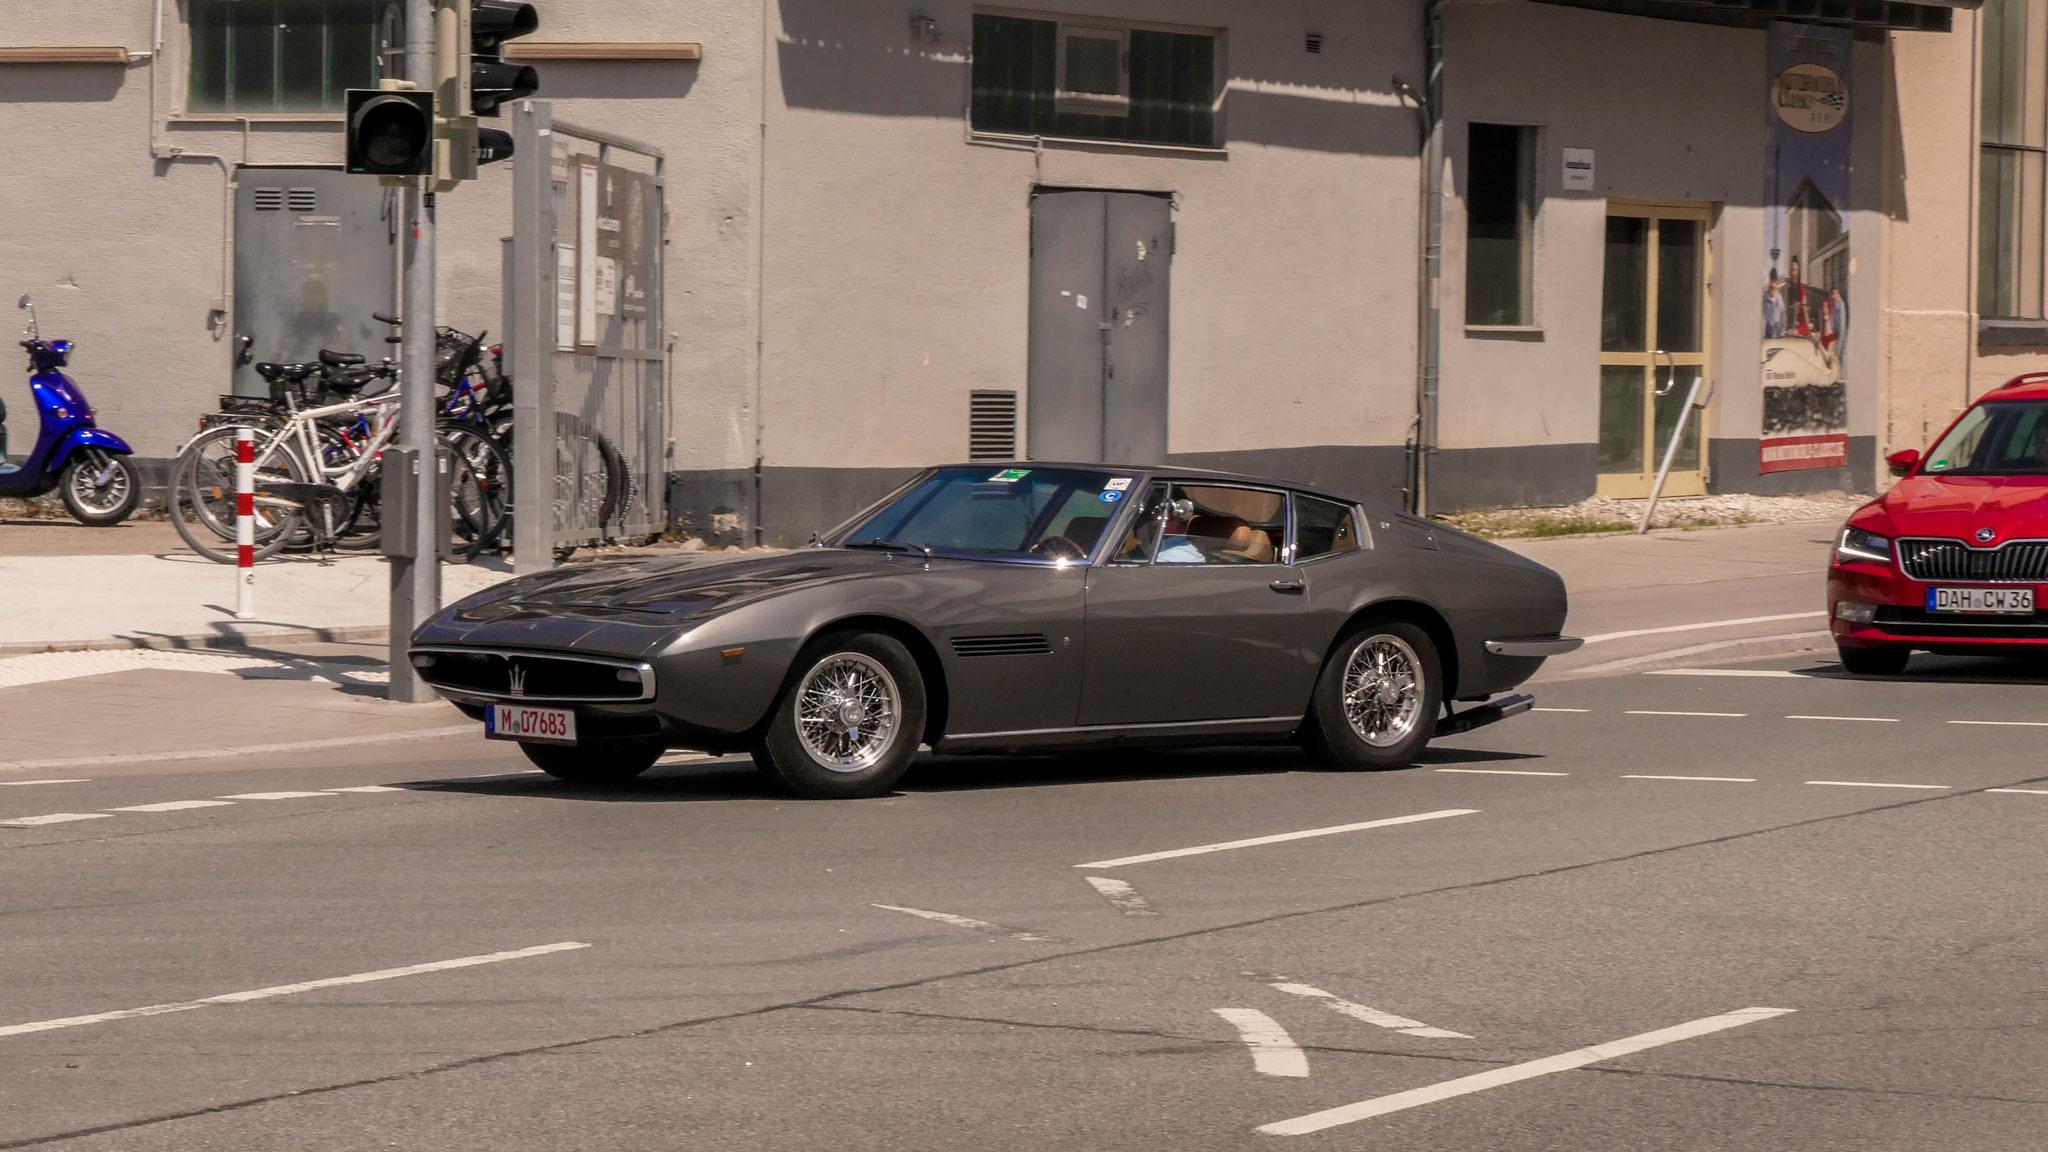 Maserati Ghibli - M-07683